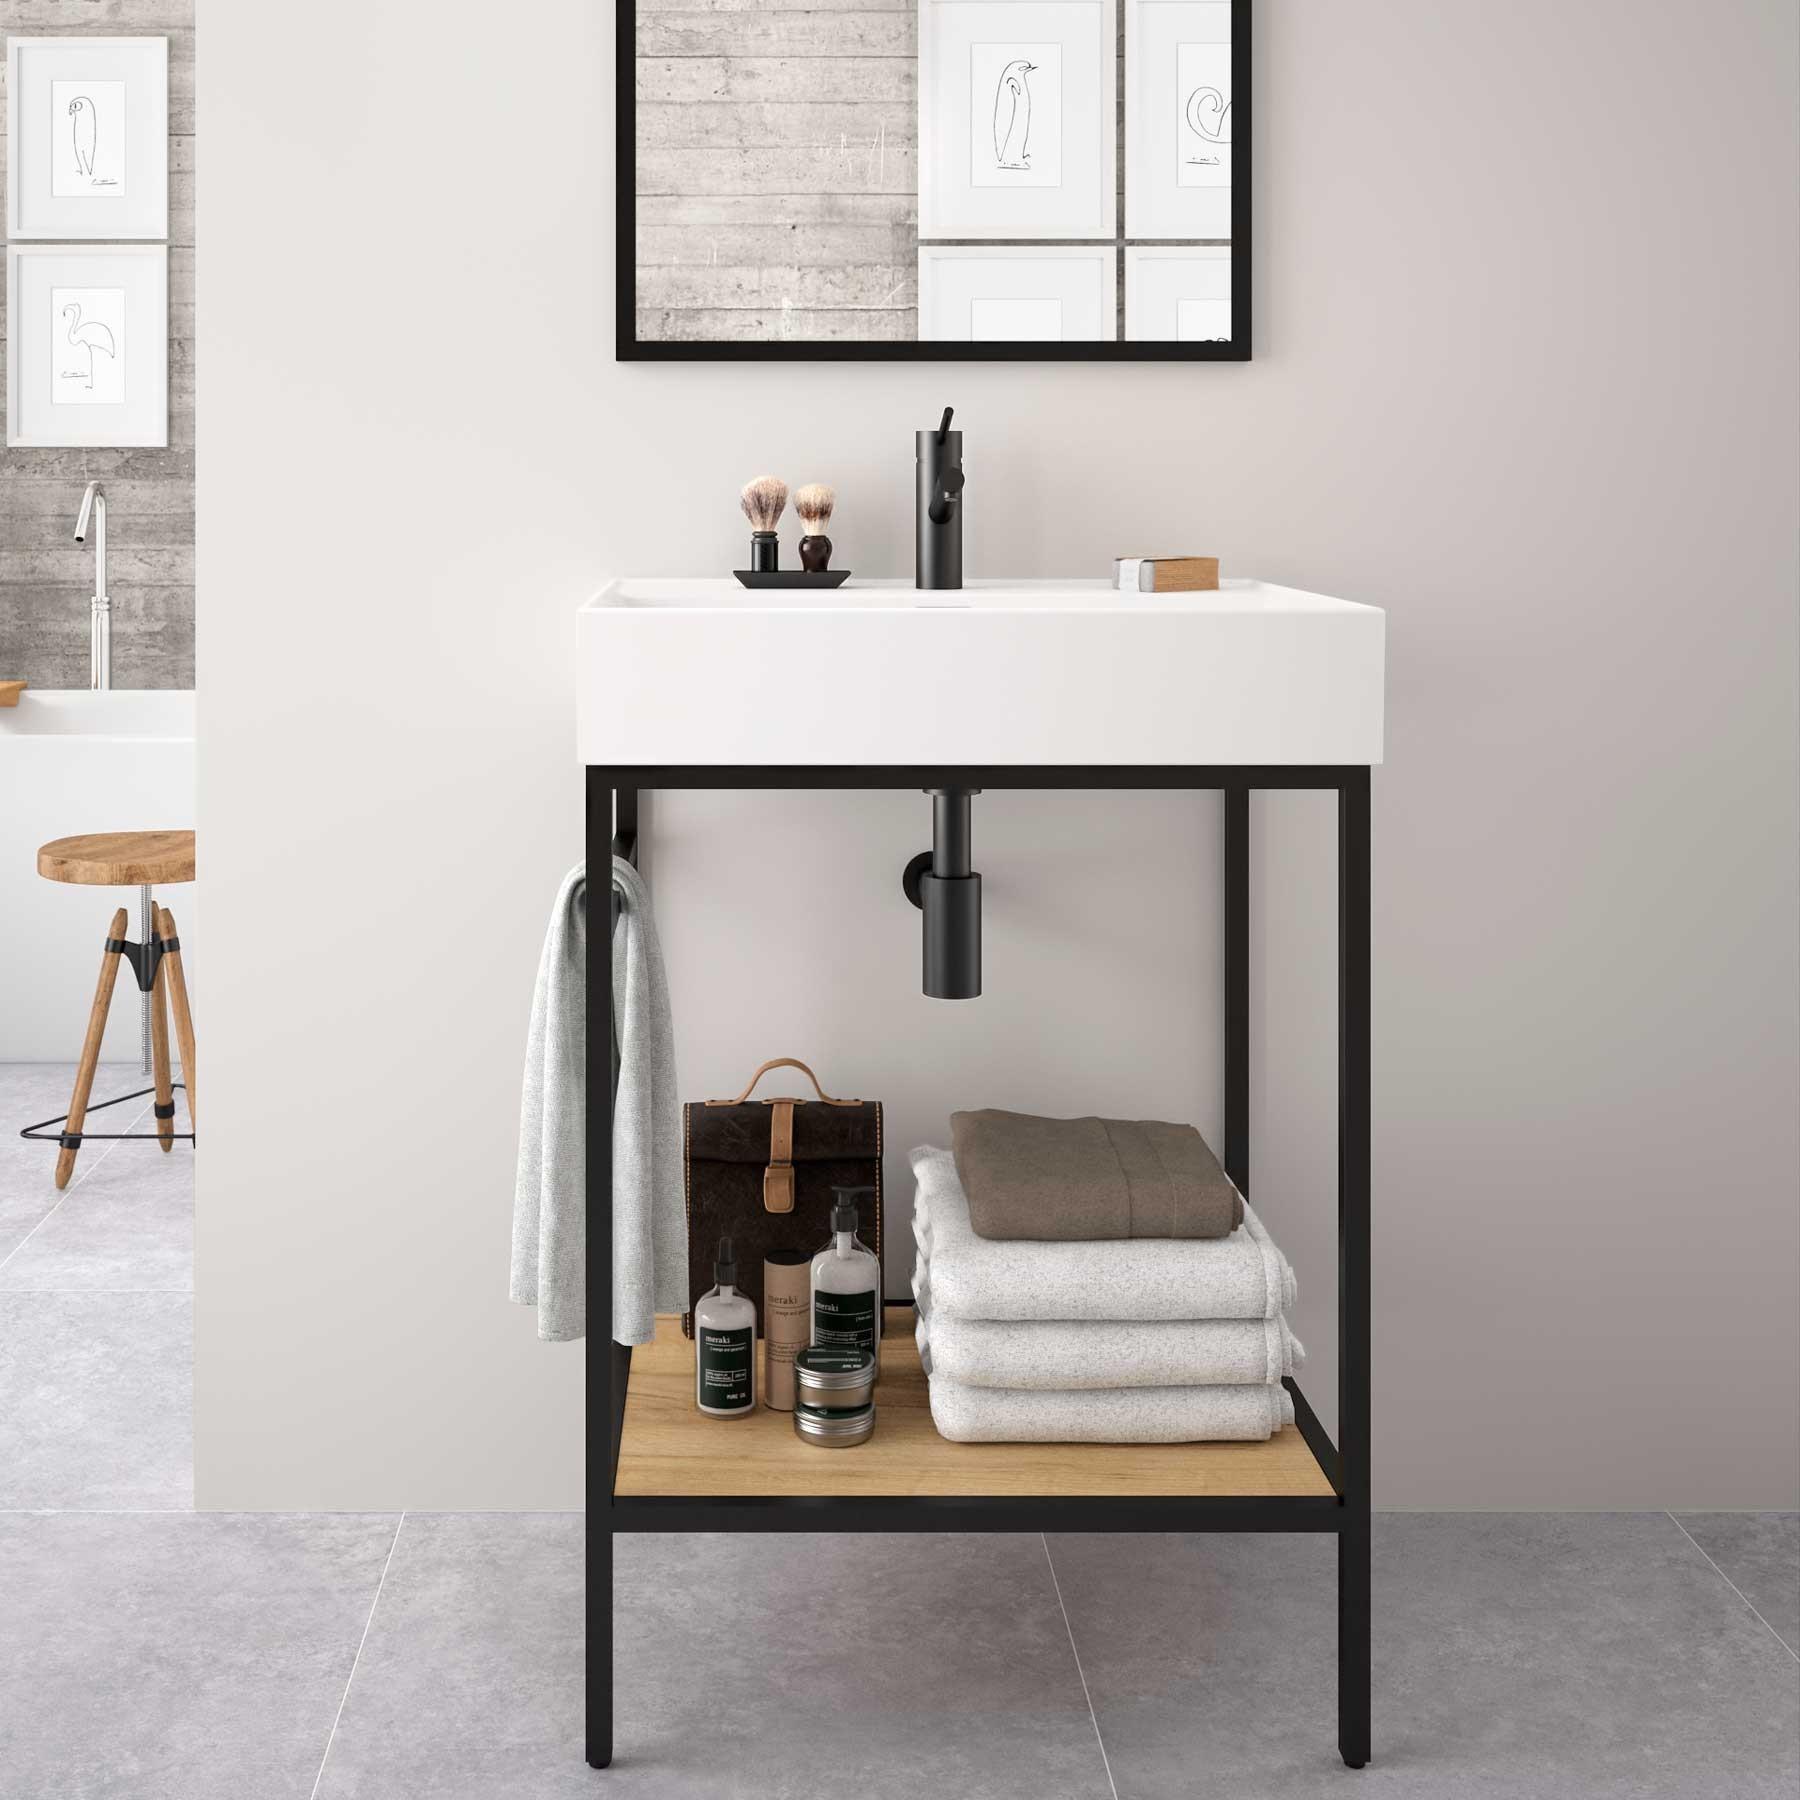 Muebles Davinci staand badkamermeubel 60cm inclusief wastafel, mat zwart frame